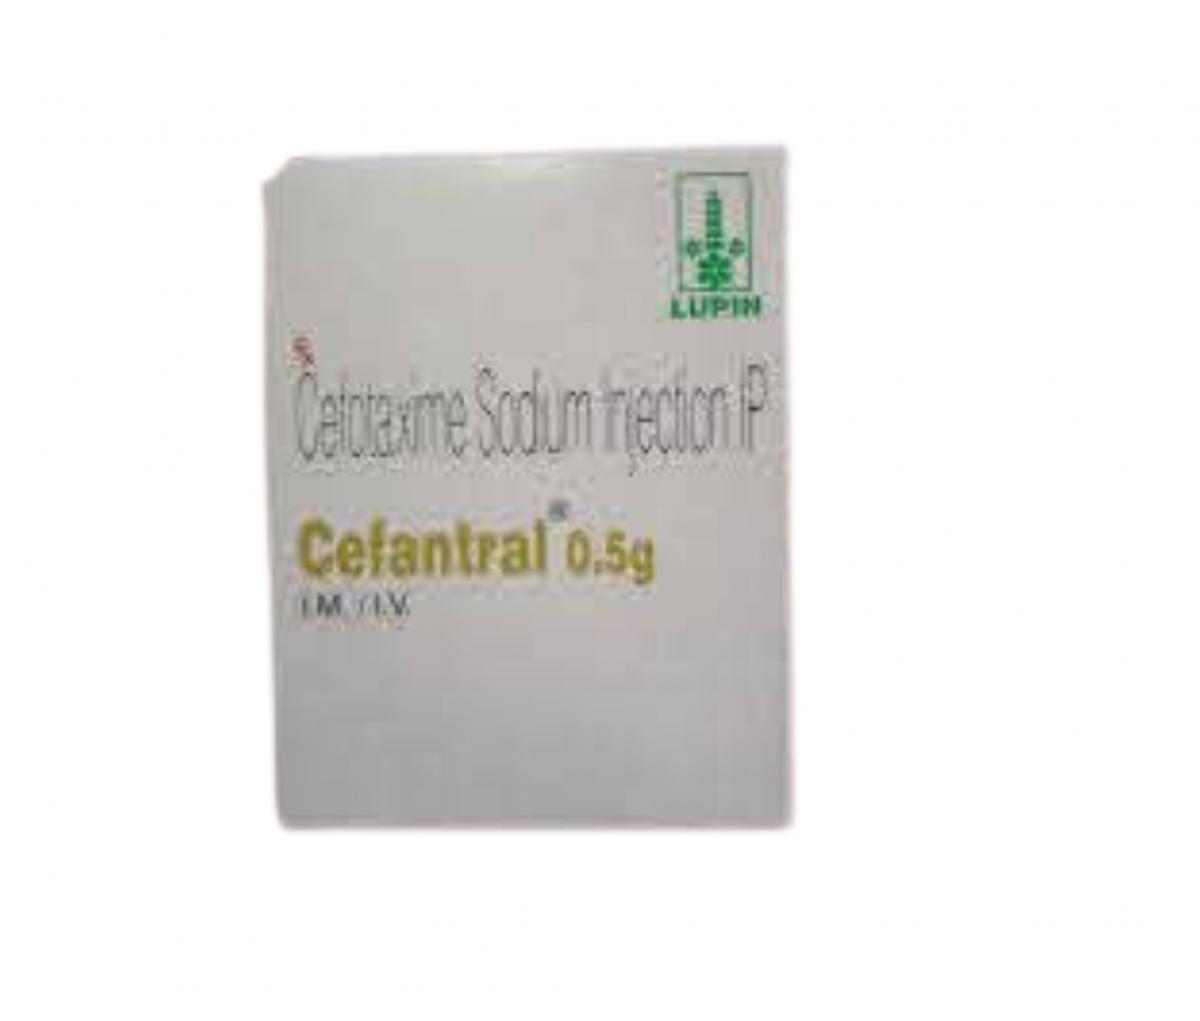 Cefantral 0.5g Injection